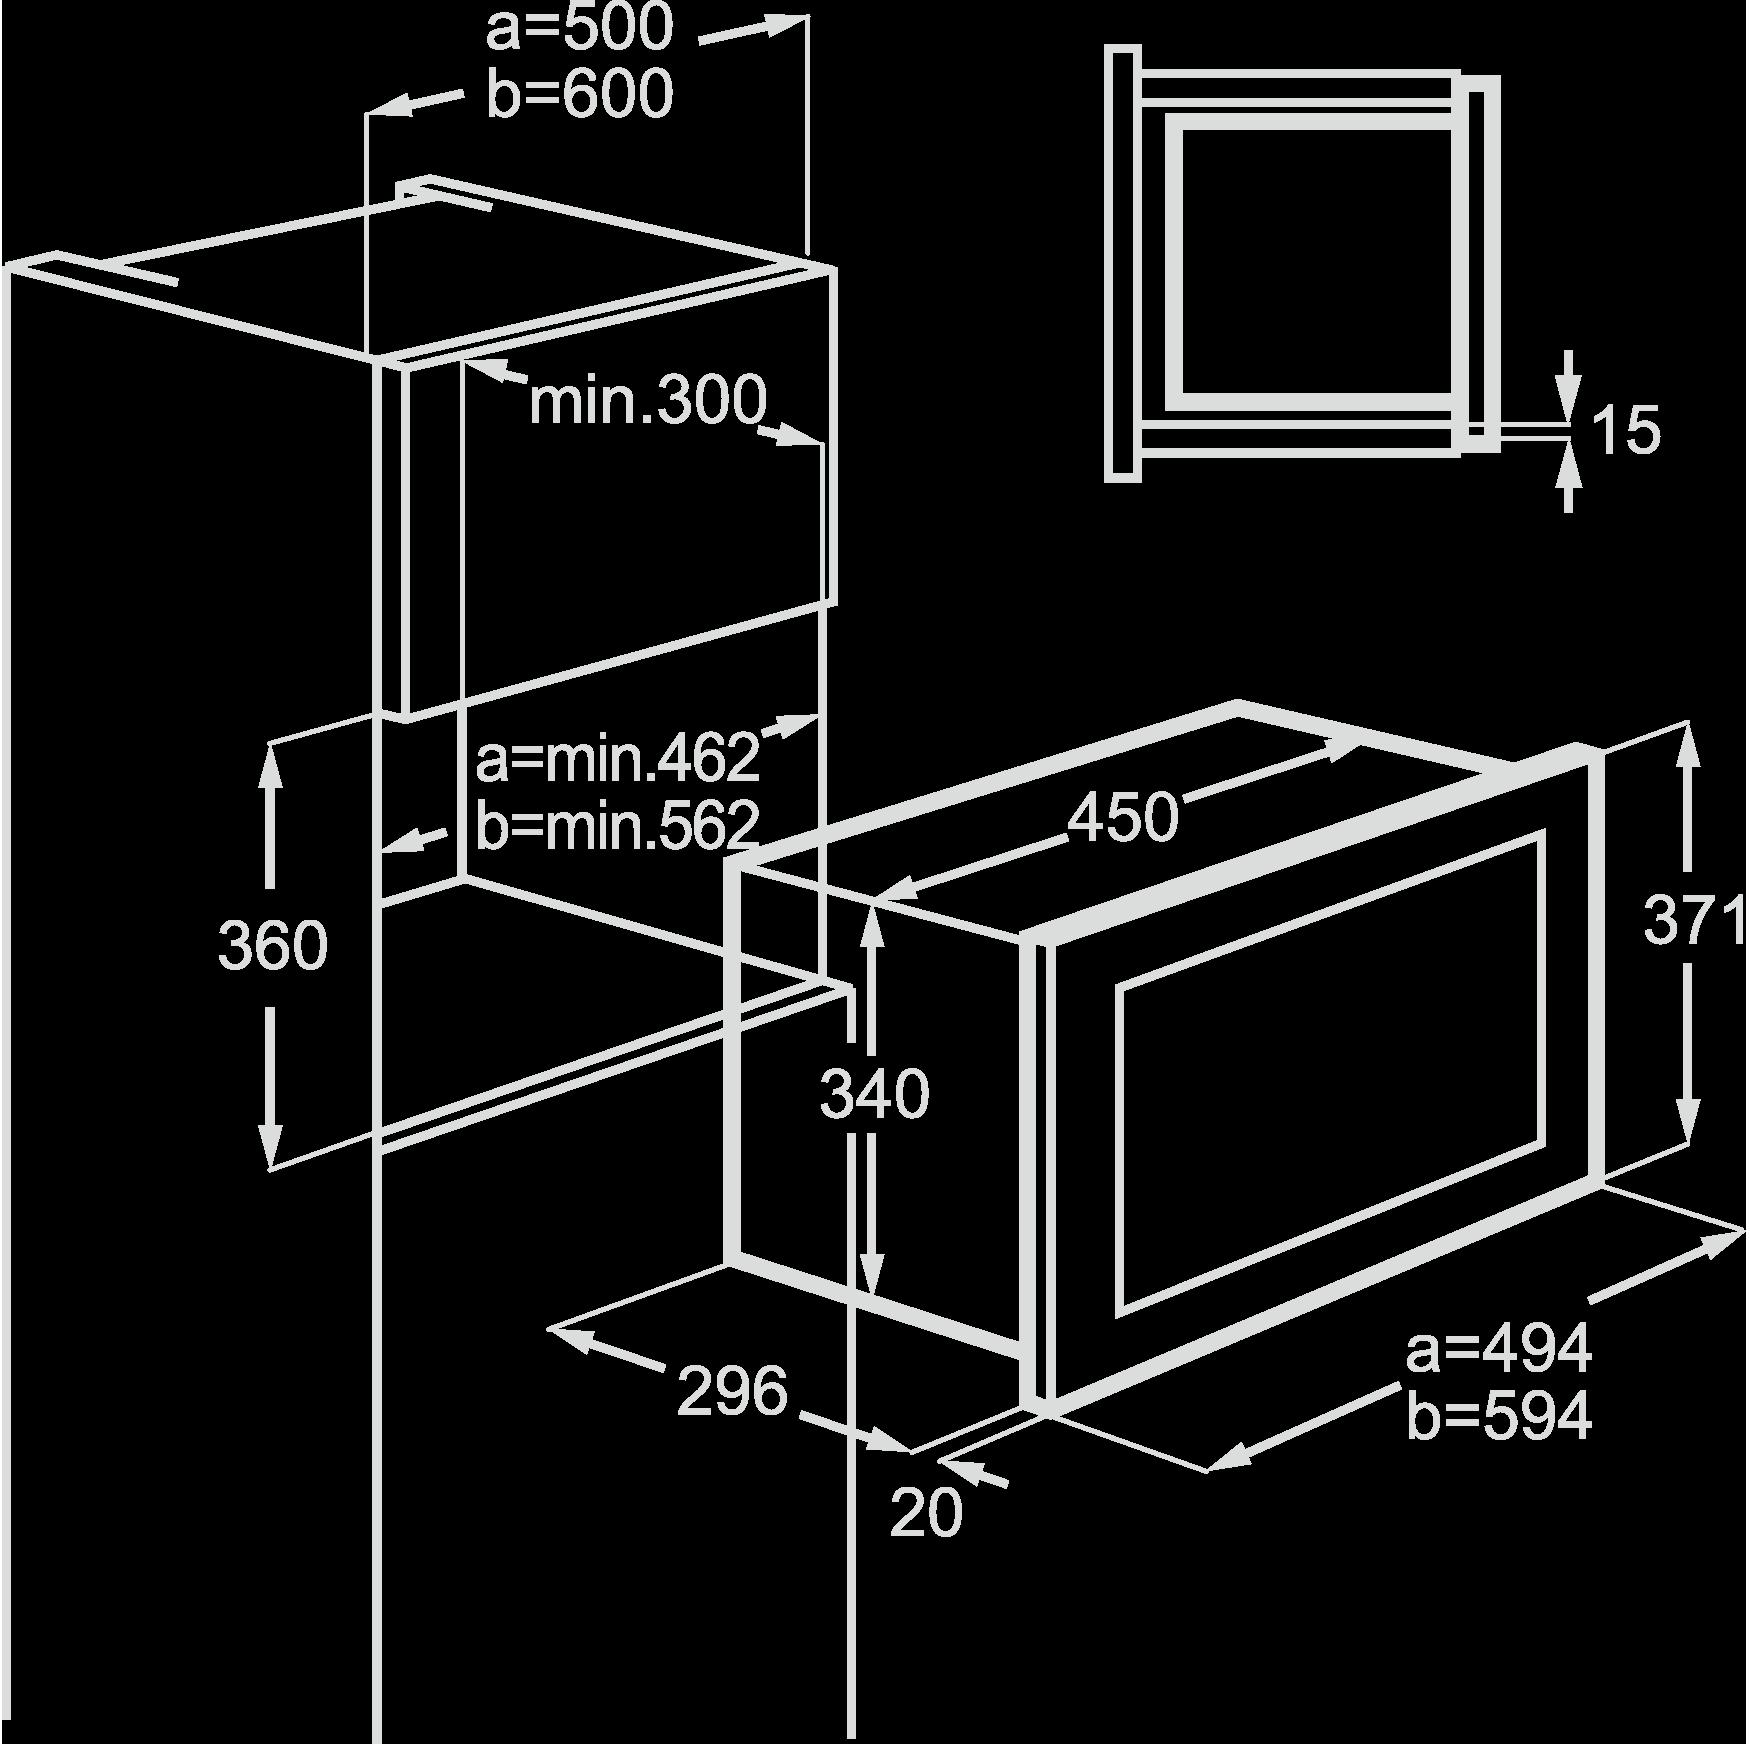 家电产品三包_Microwave 嵌入式微波炉系列_38厘米Microwave 嵌入式微波炉-德国AEG ...